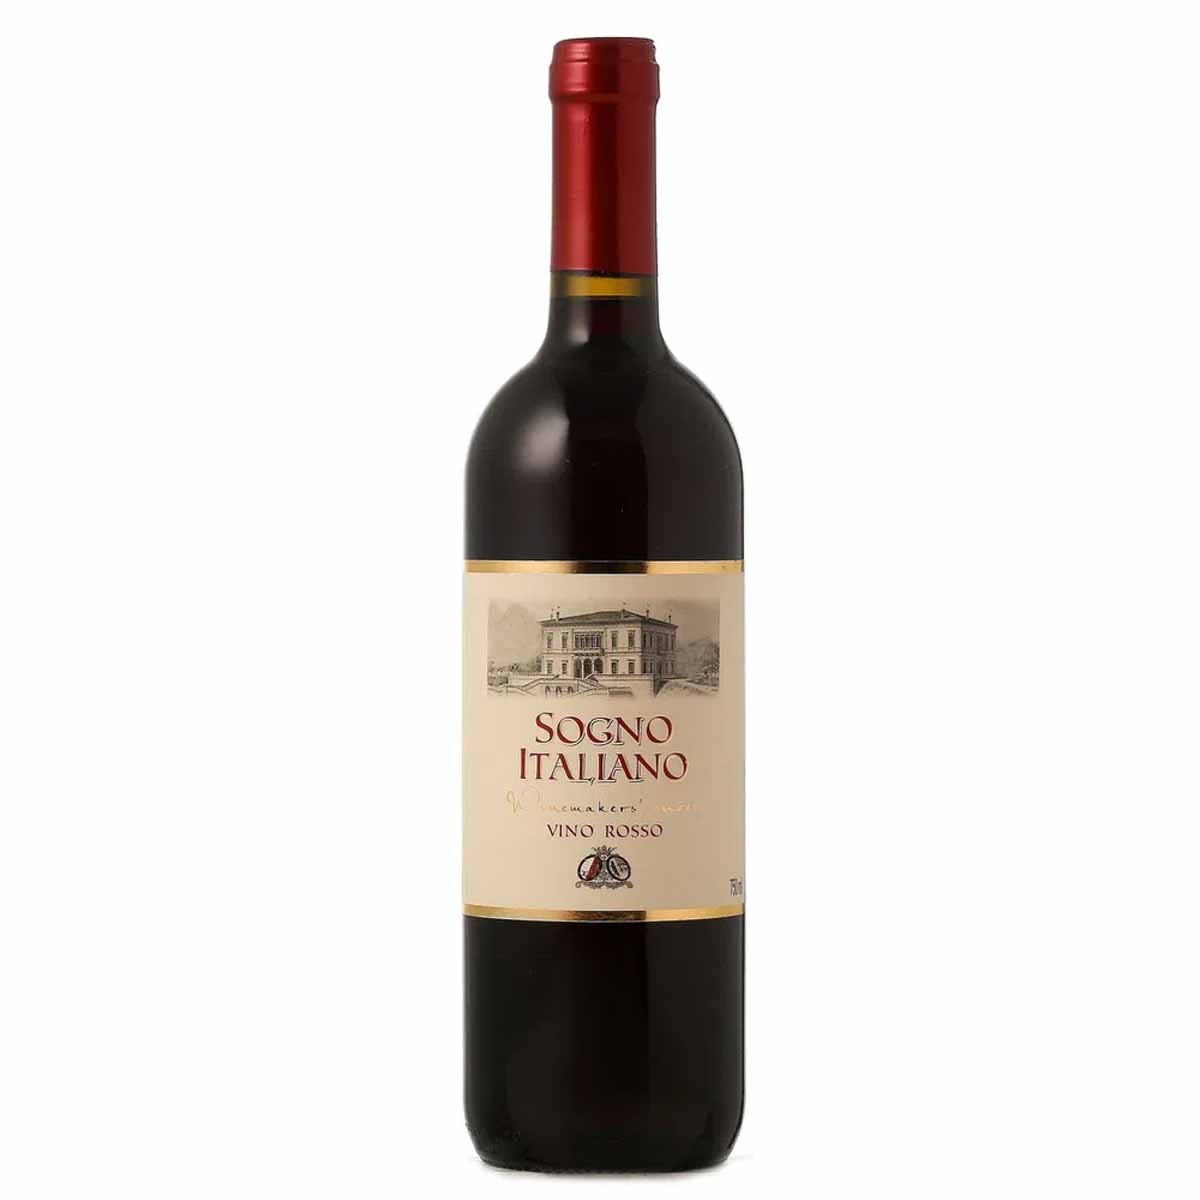 Vinho Tinto Italiano Sogno Italiano Vino Rosso 750ml